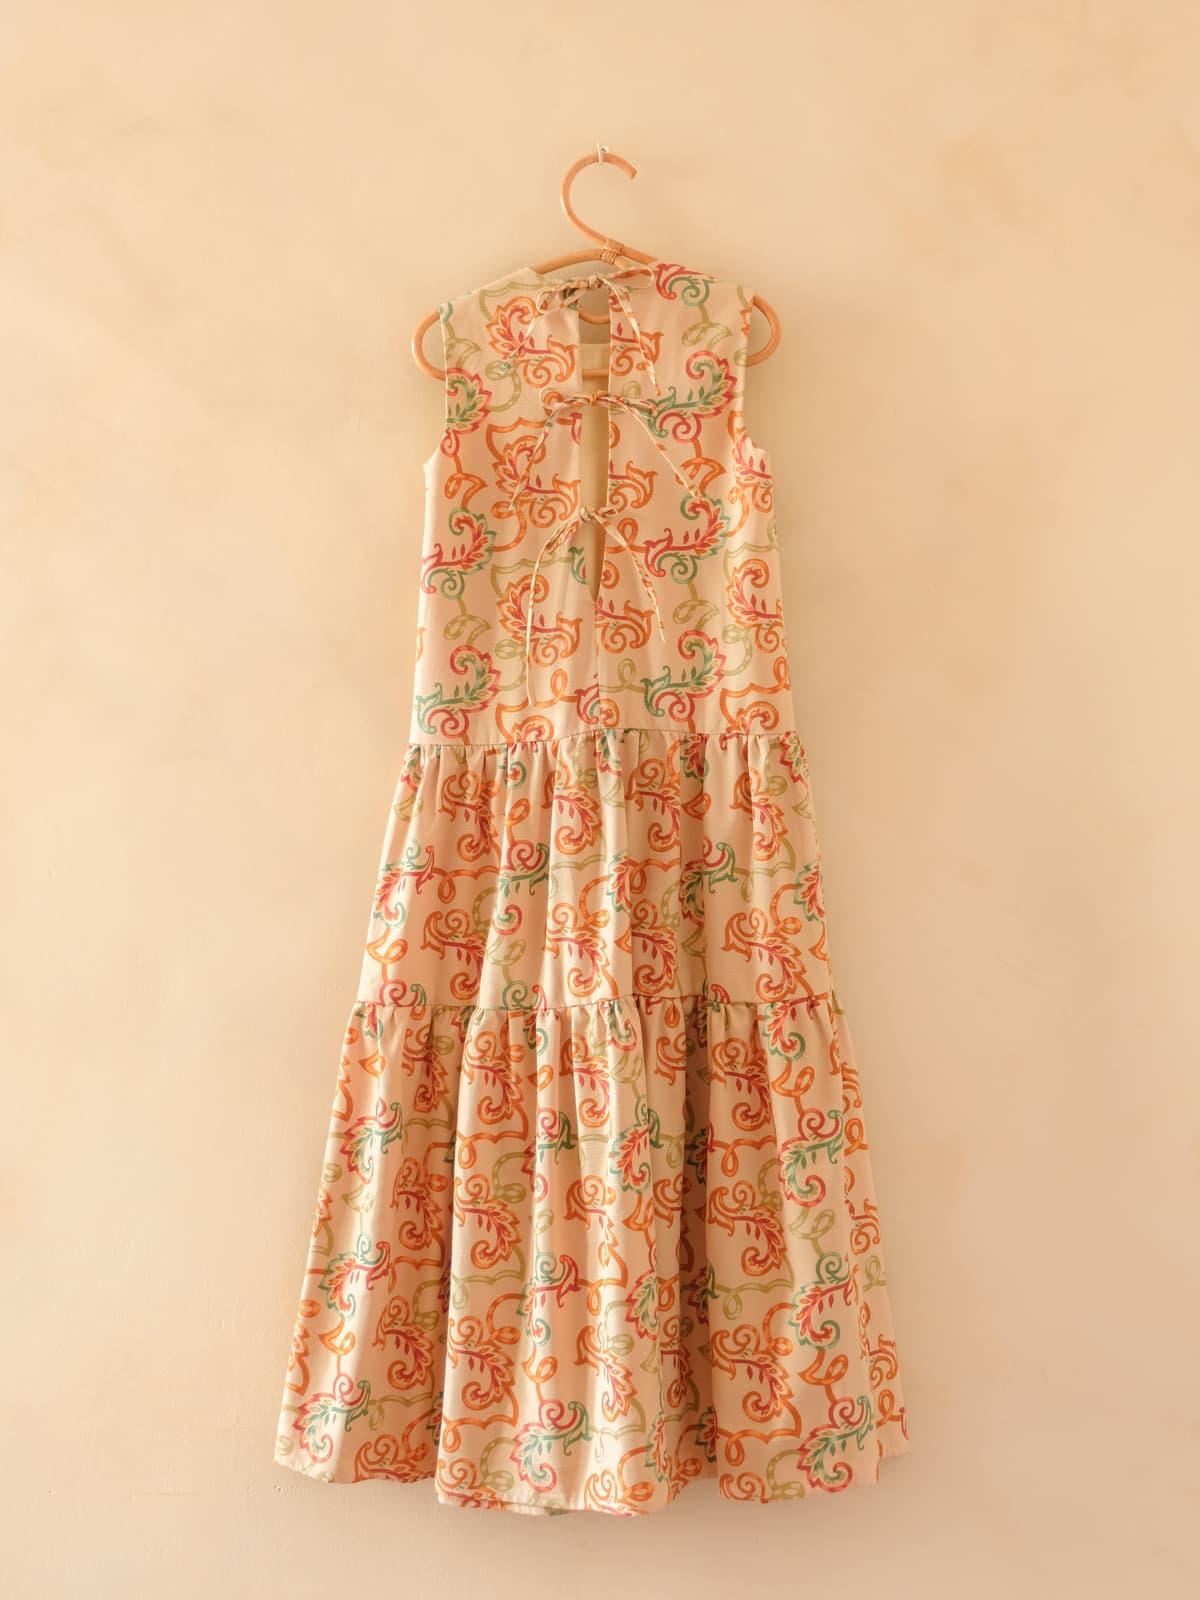 volute dress